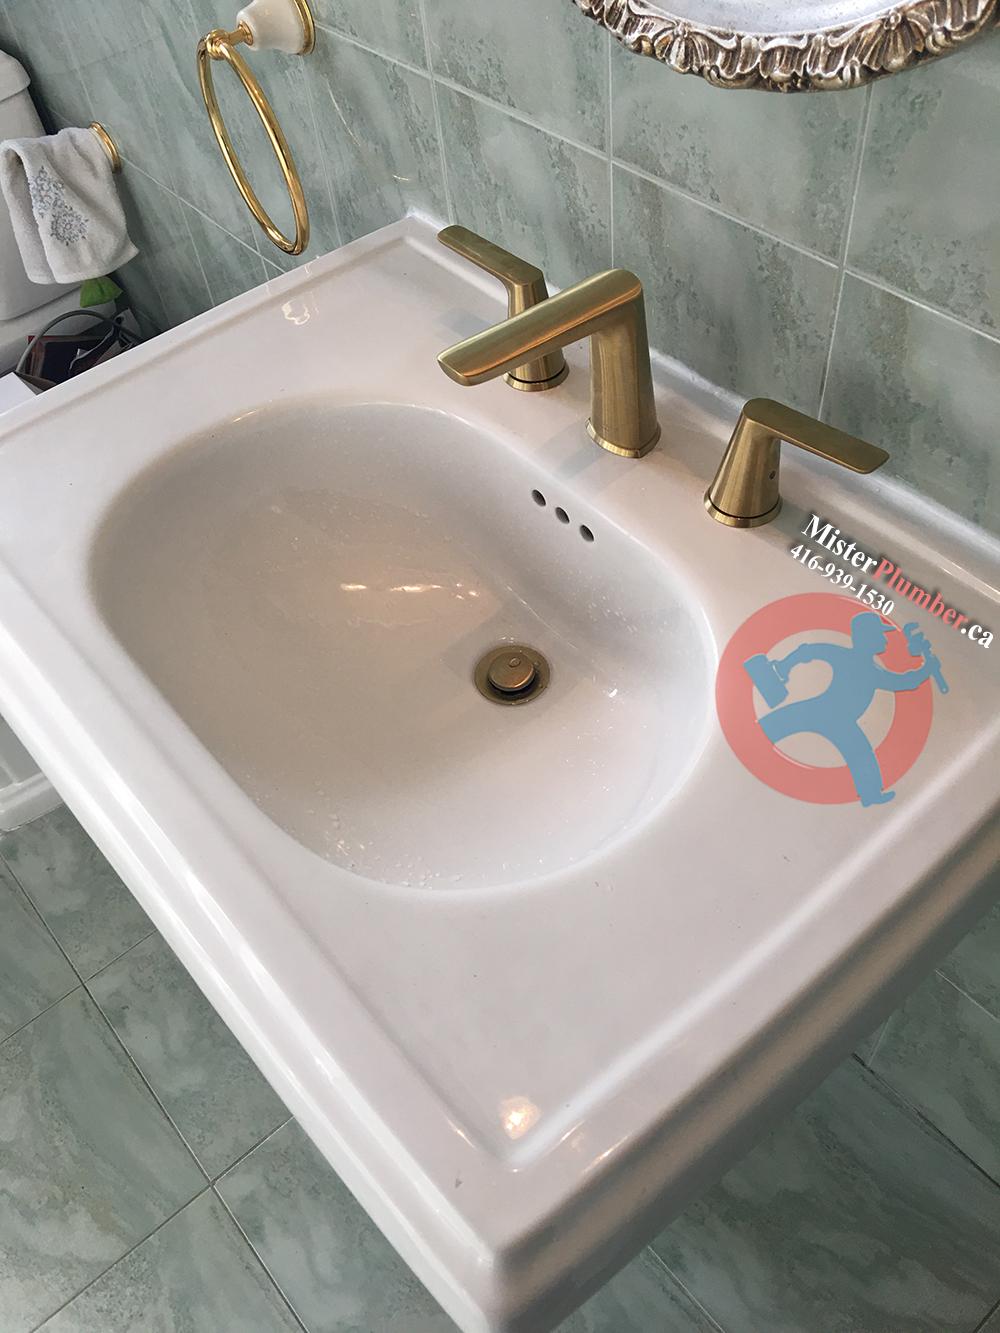 pedestal sink faucet replacement